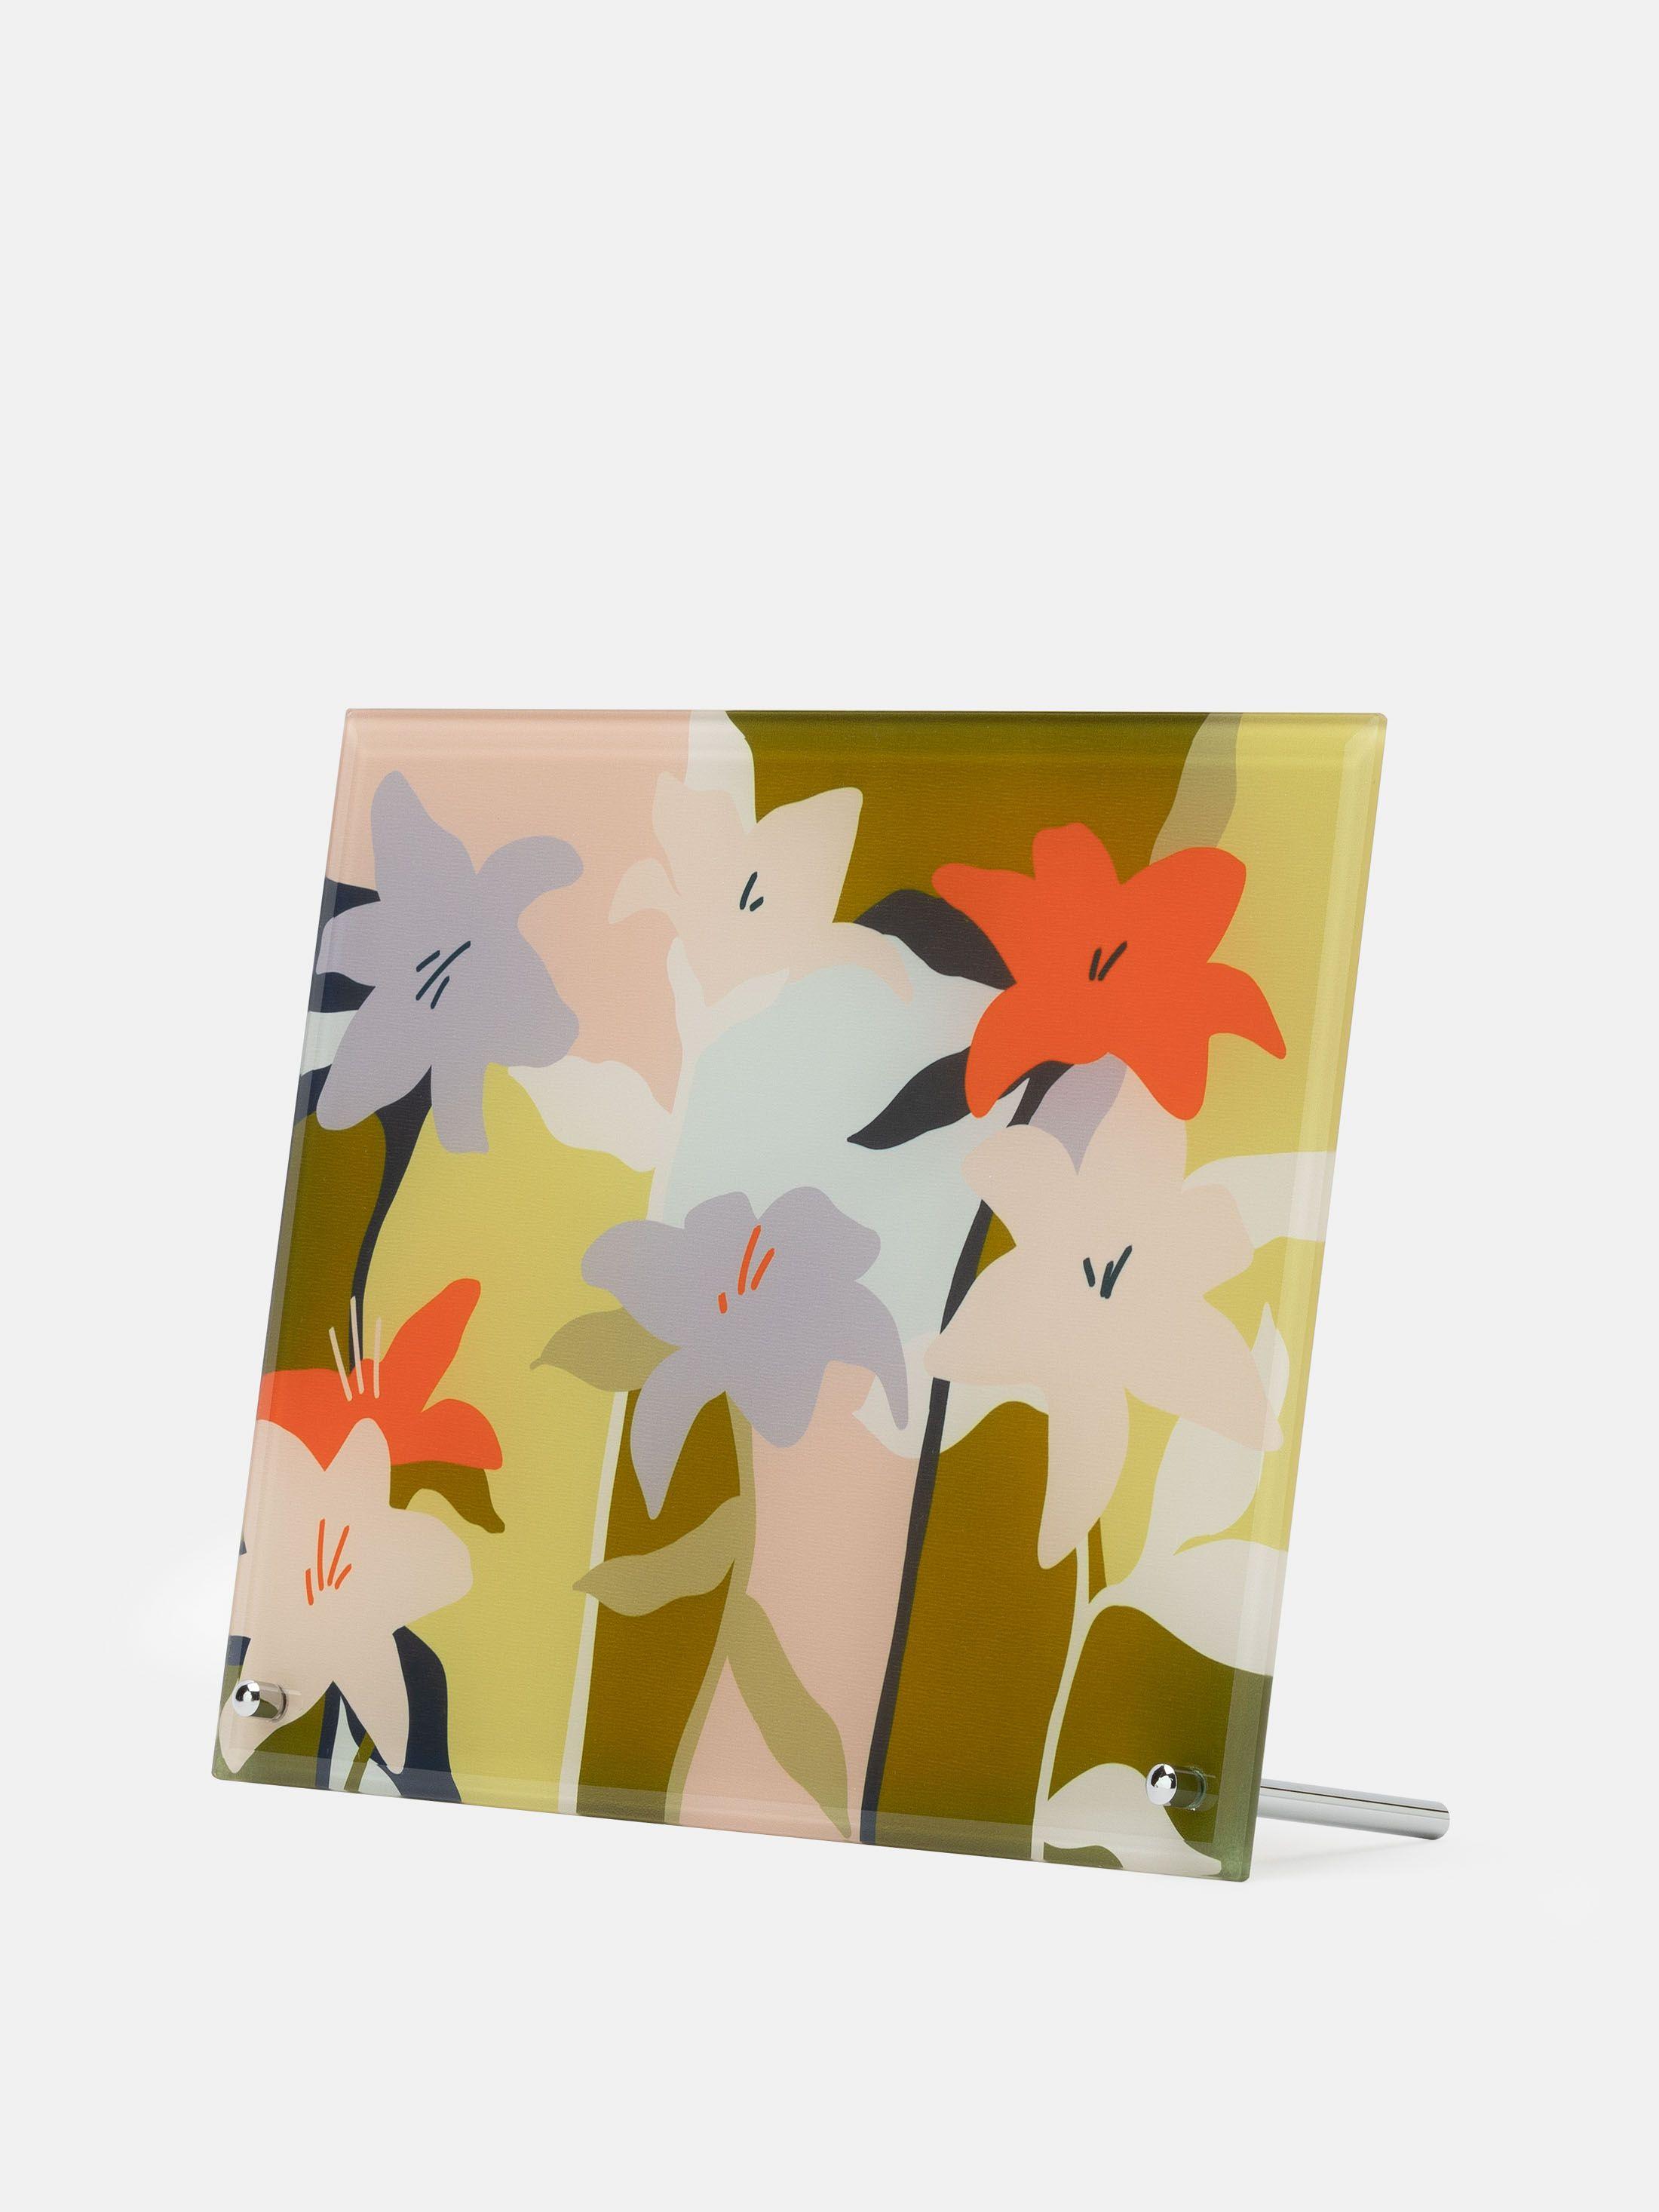 Glass Prints Online